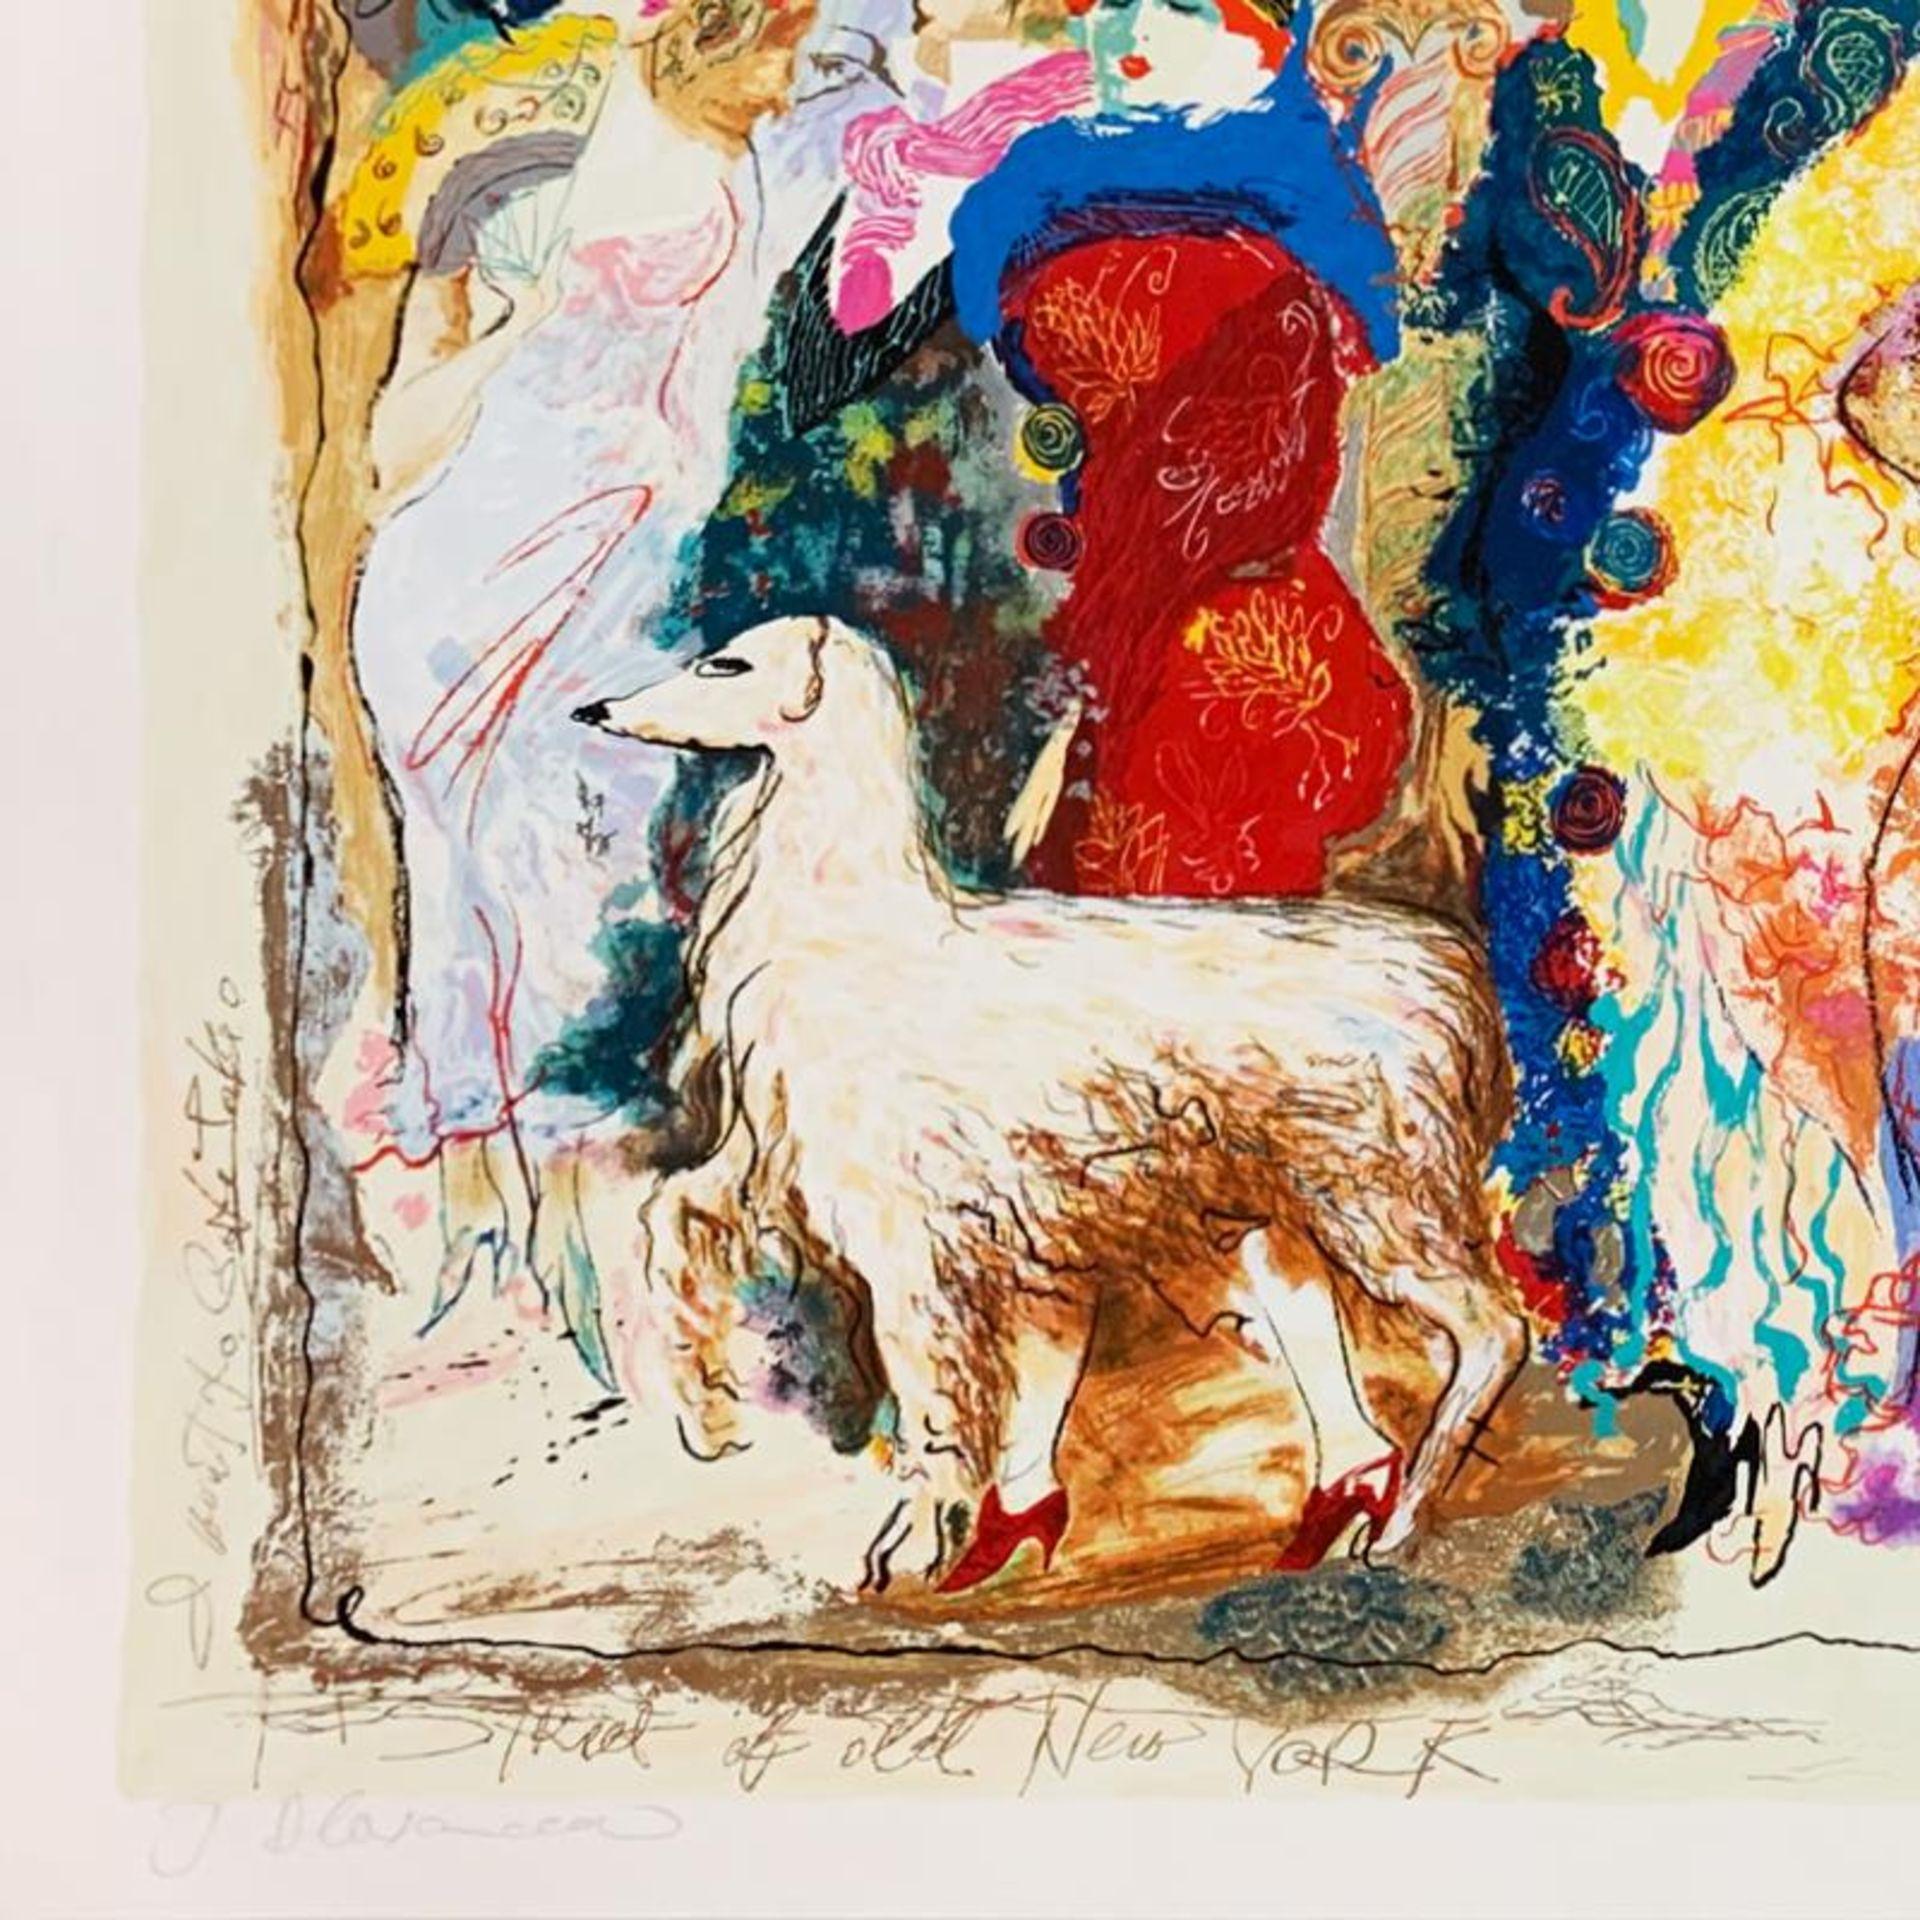 Alexander Galtchansky (1959-2008) and Tanya Wissotzky (1959-2006), Hand Signed L - Image 3 of 3